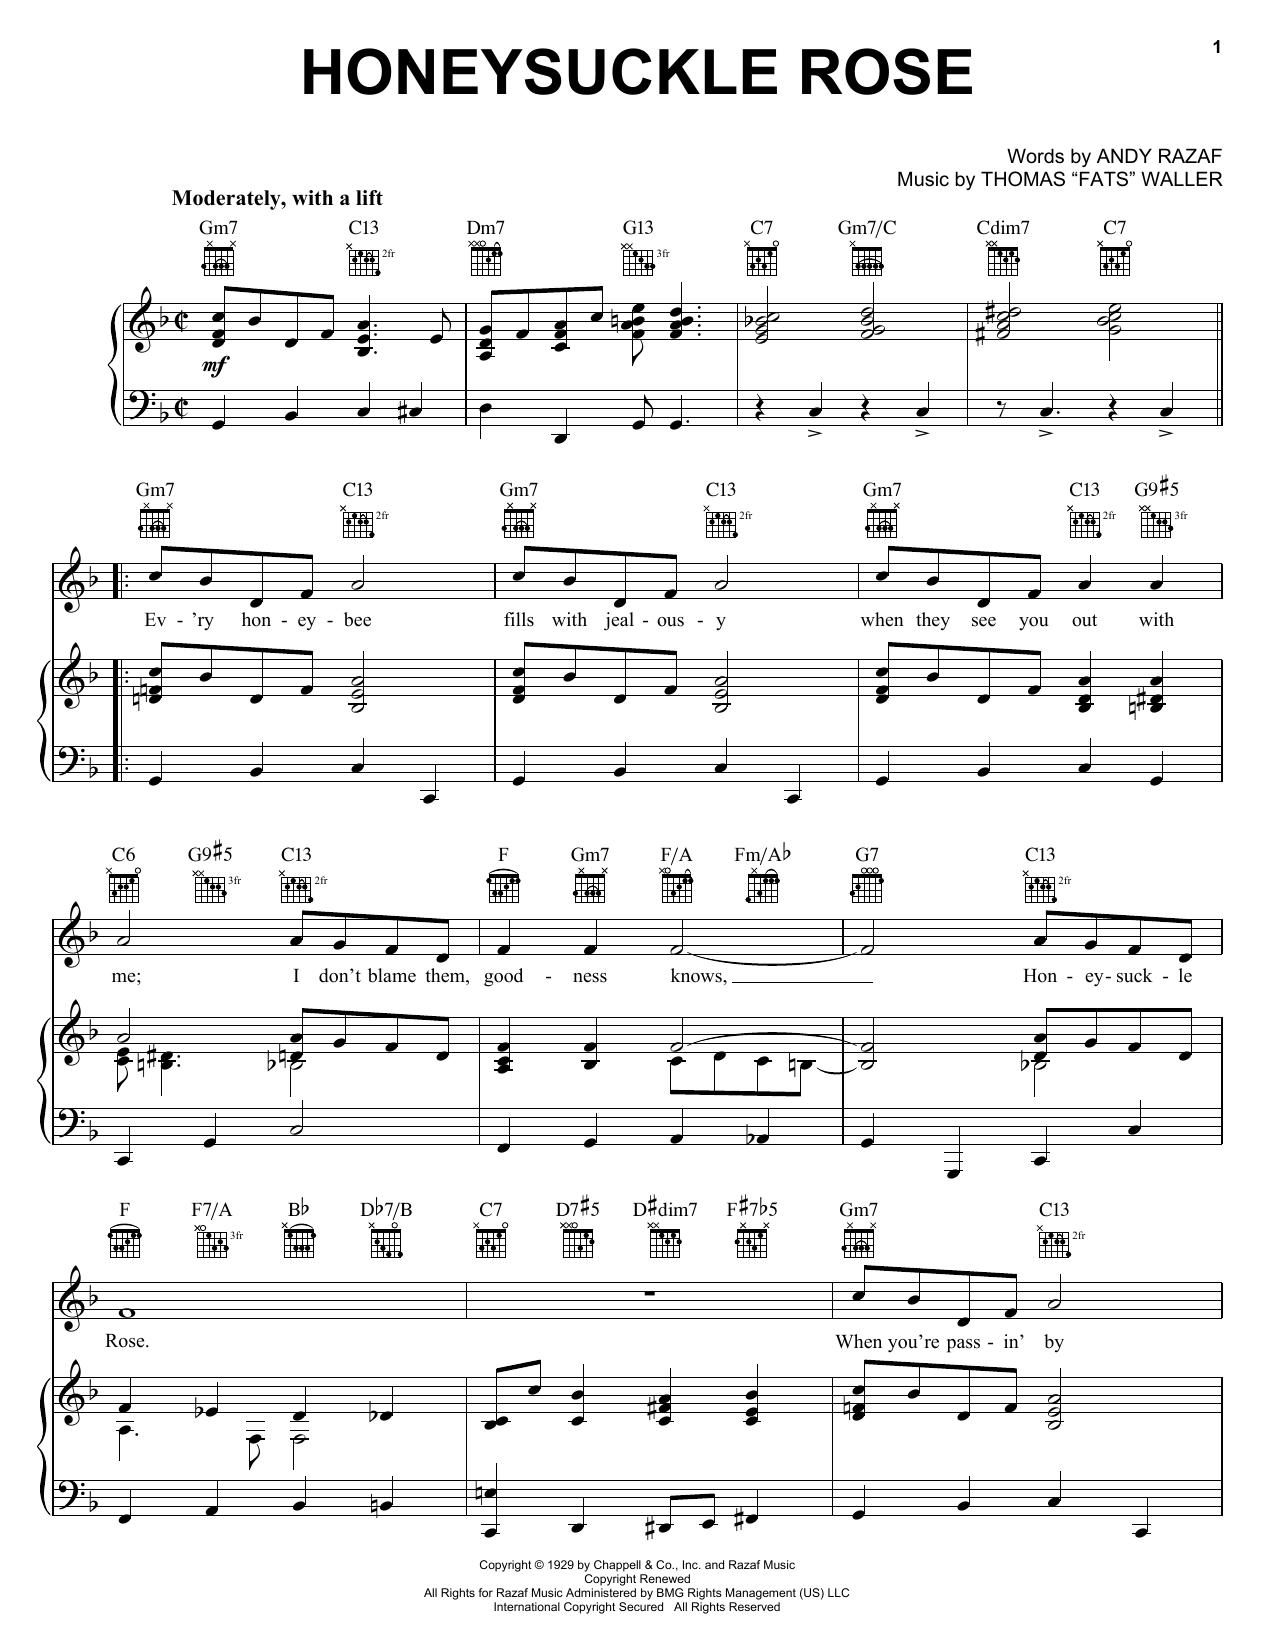 Django Reinhardt Honeysuckle Rose sheet music notes and chords. Download Printable PDF.